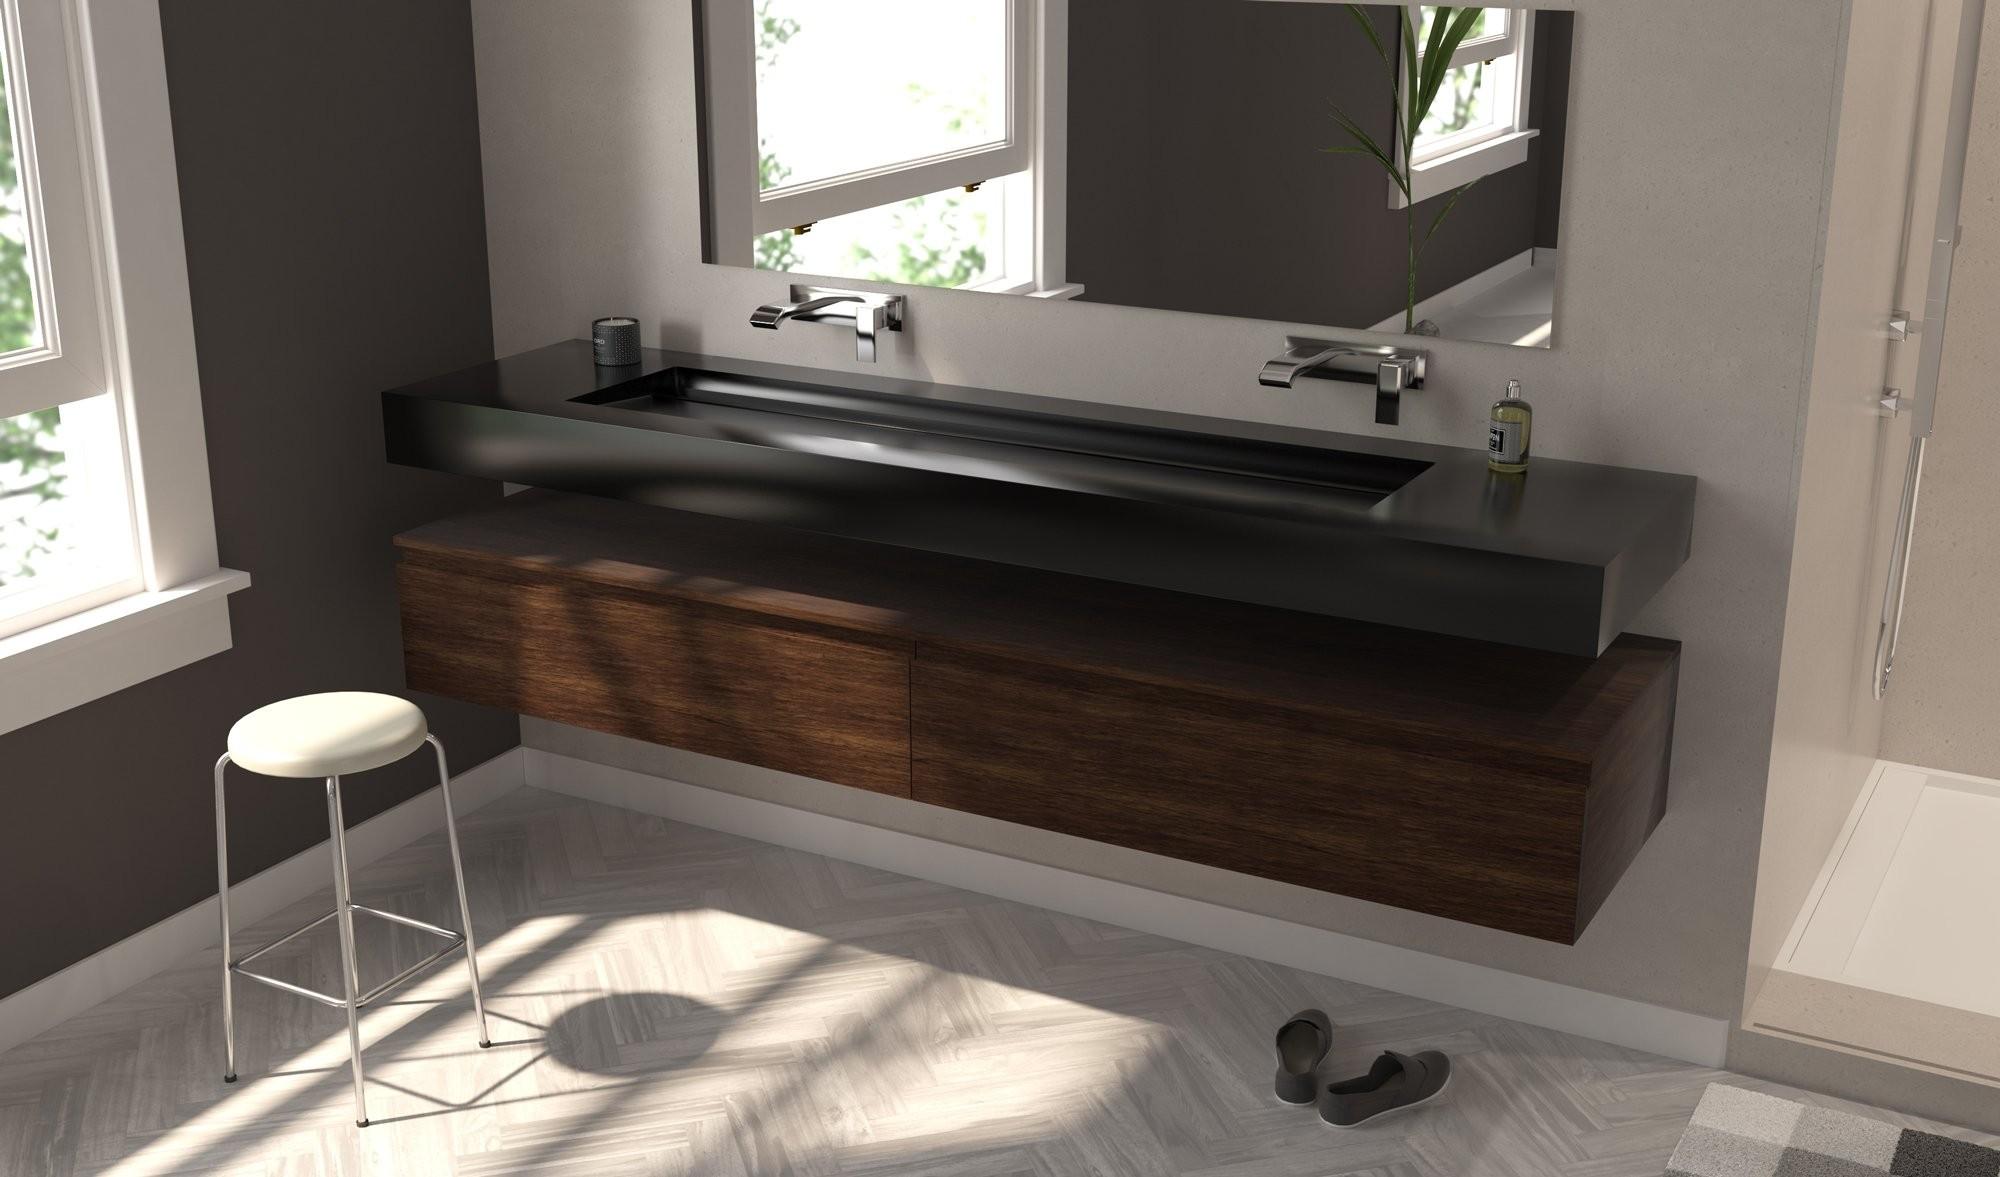 Plan Vasque Sur Mesure vasque corian® deep nocturne alabama plus - lavabo solid